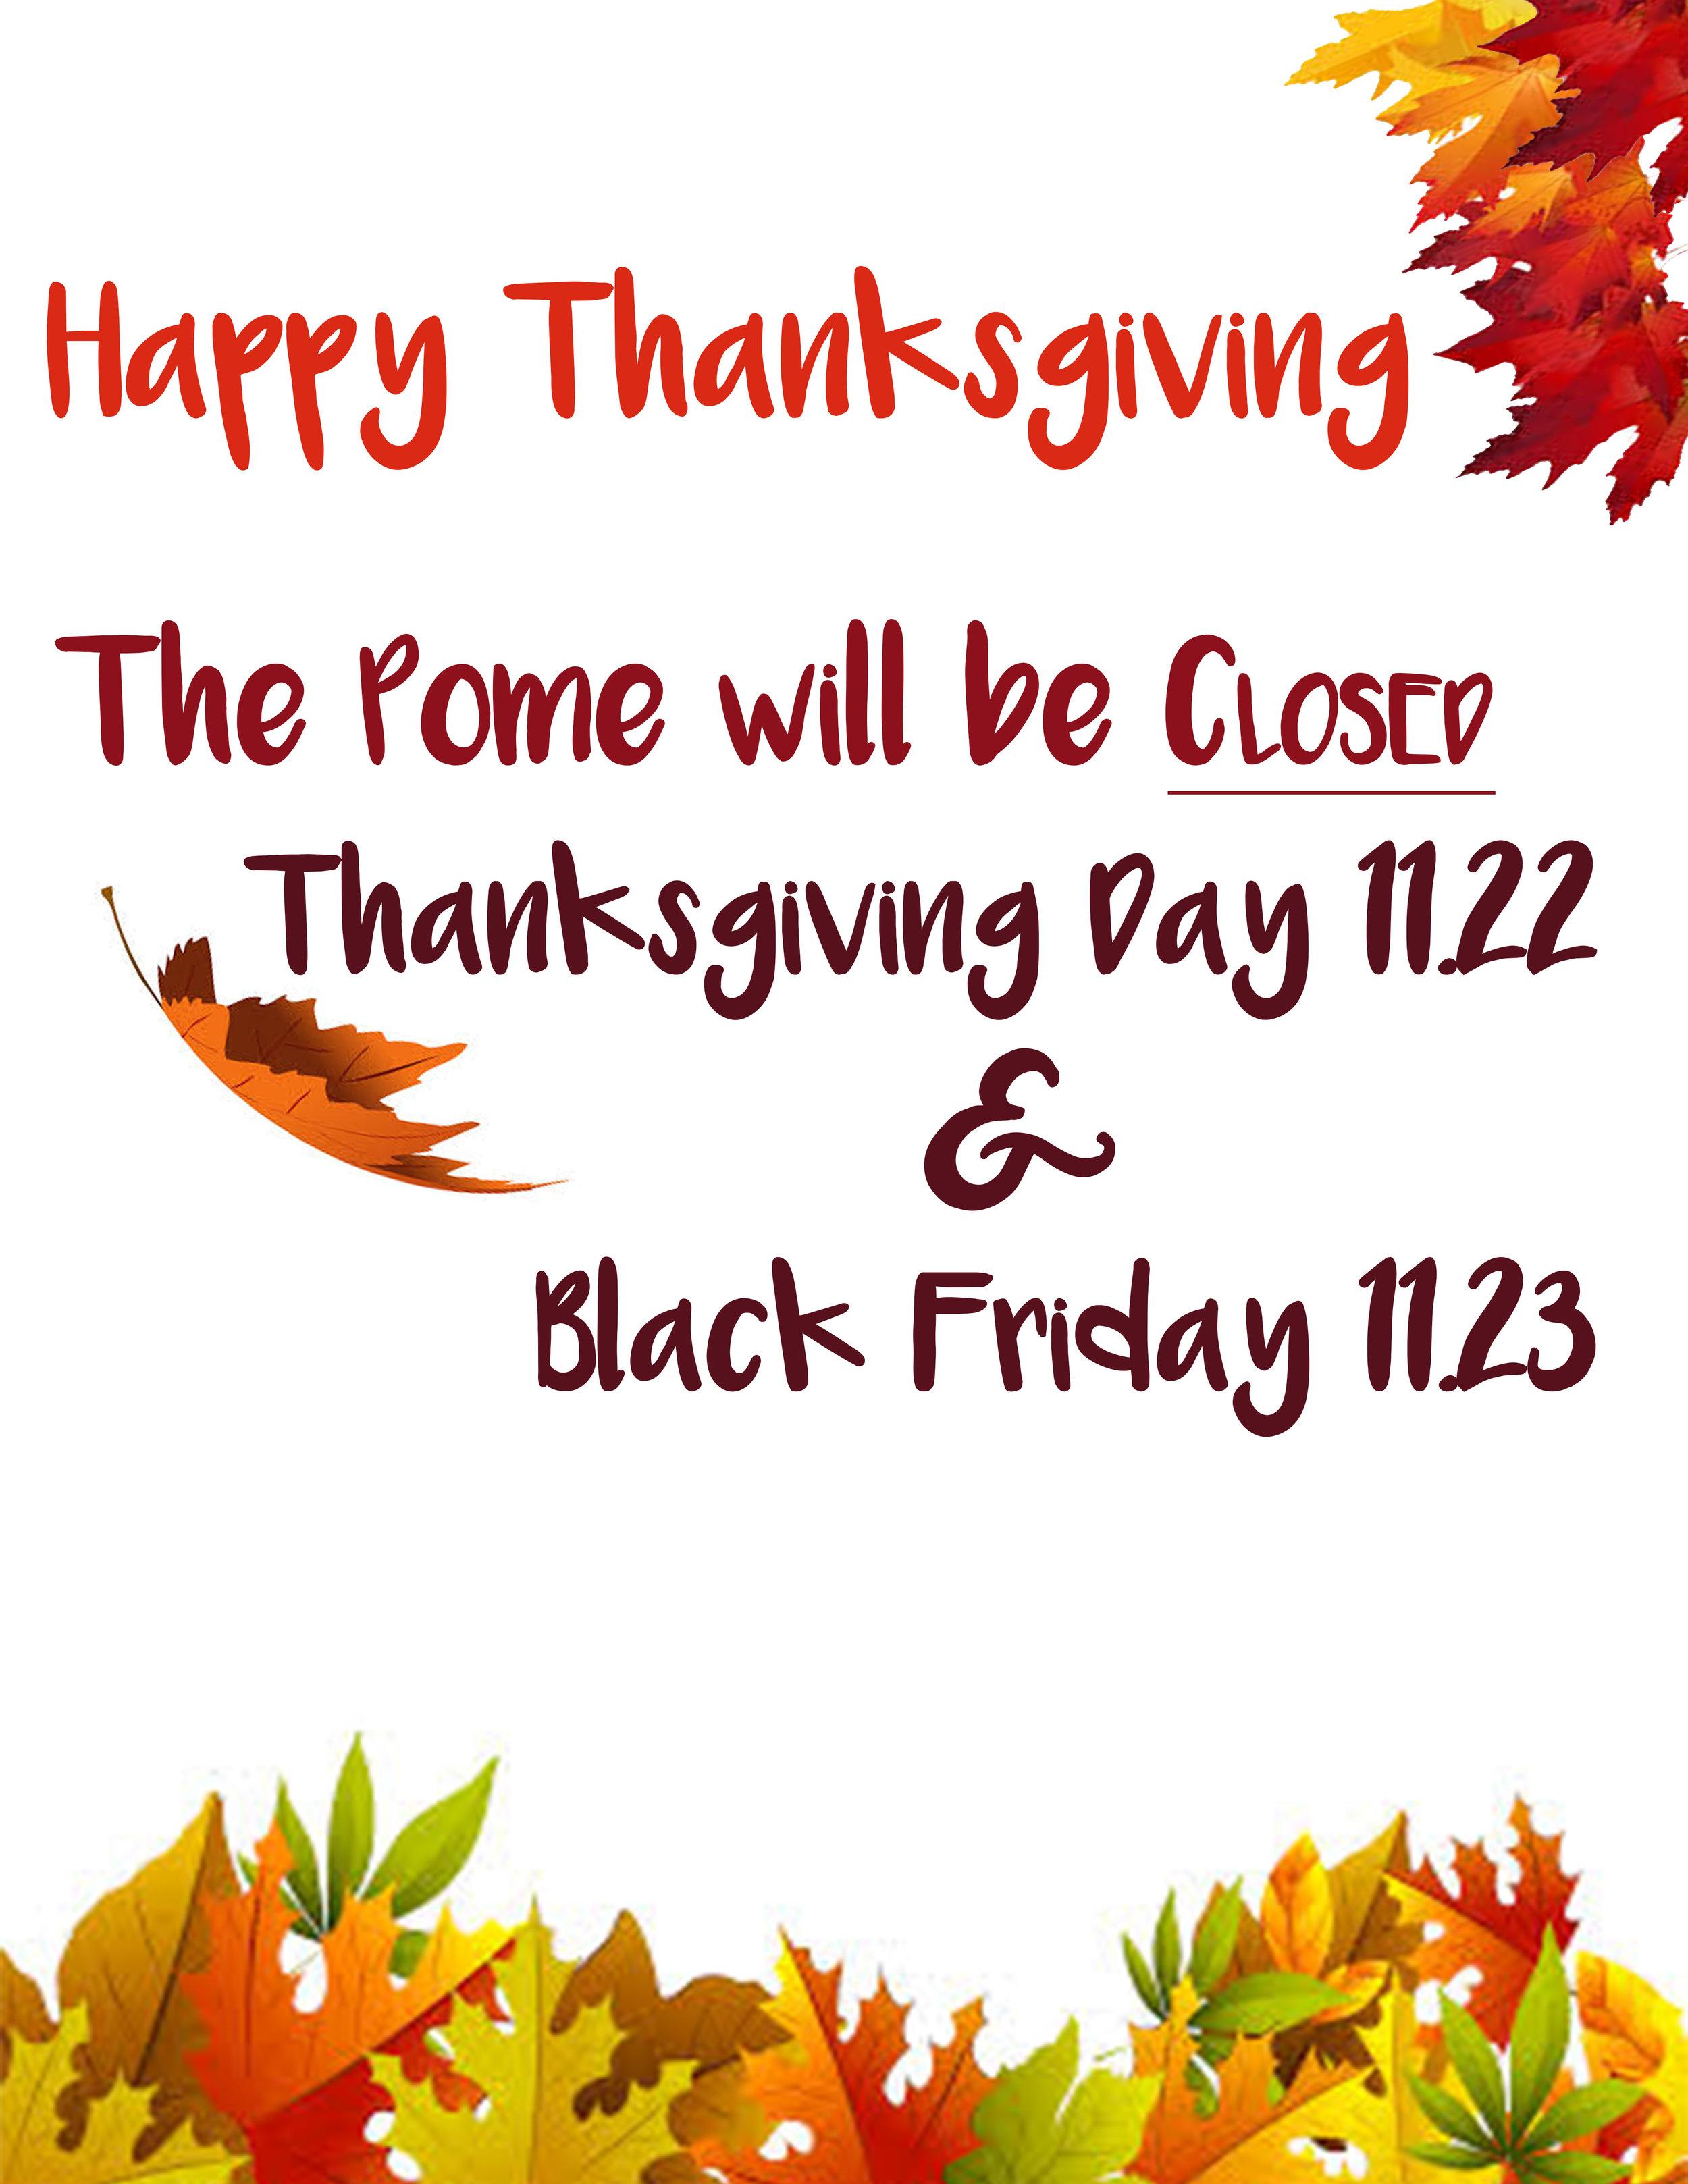 thanksgivingmessage_2018.jpg